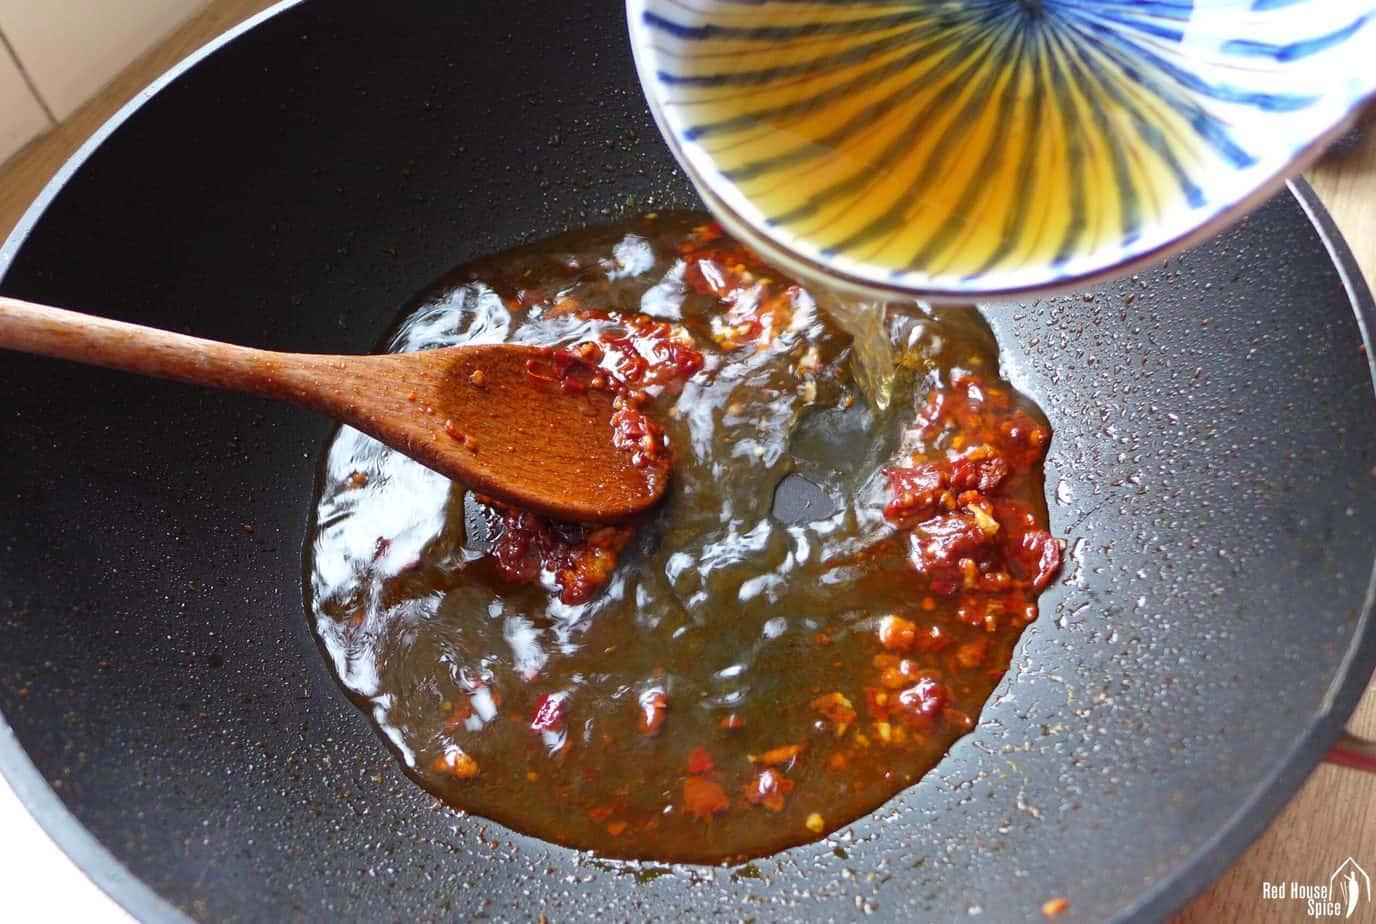 pouring liquid into a wok